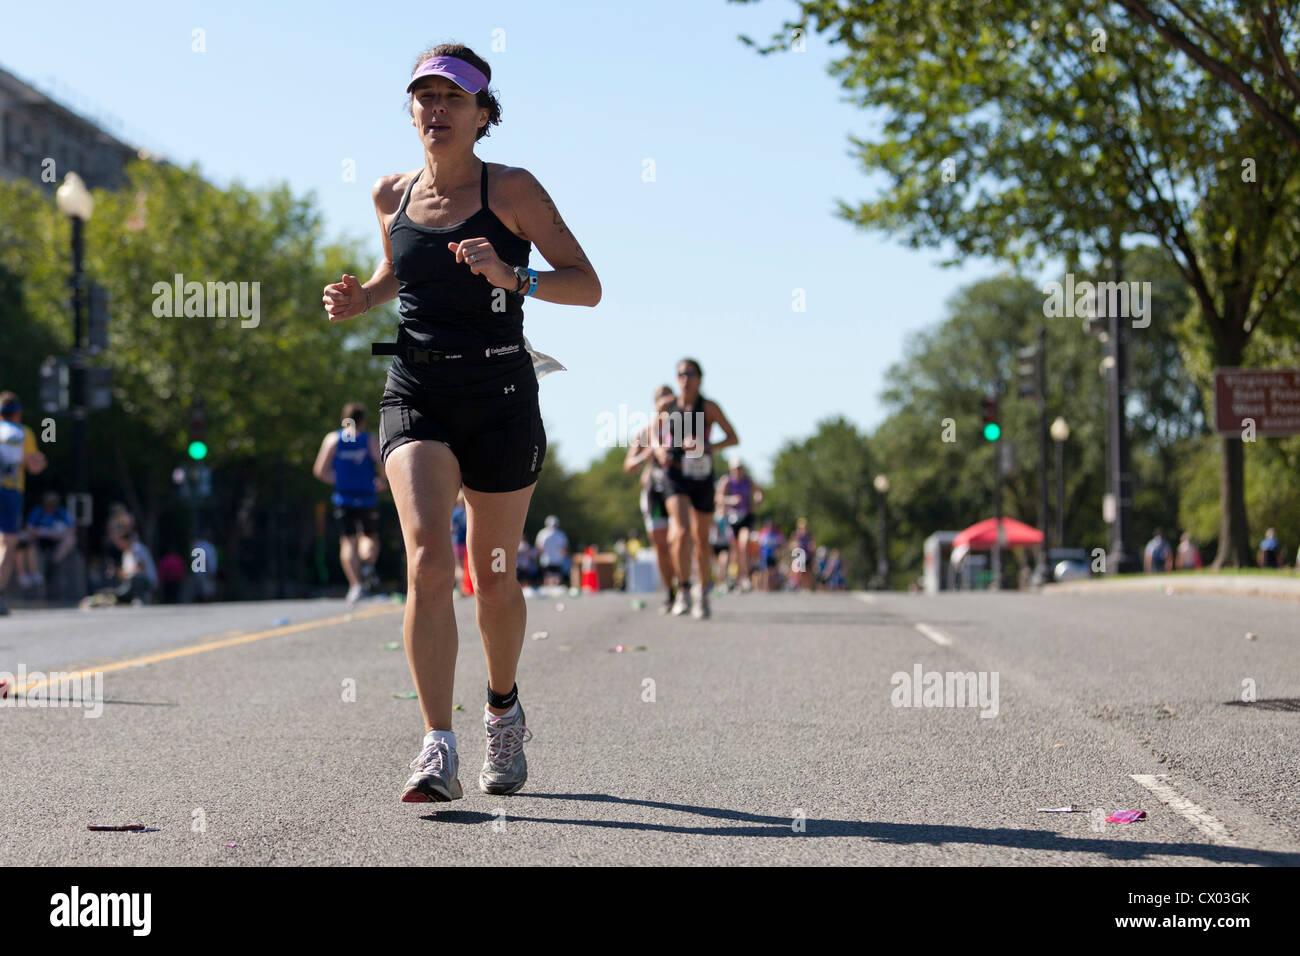 racer running in a marathon - Stock Image